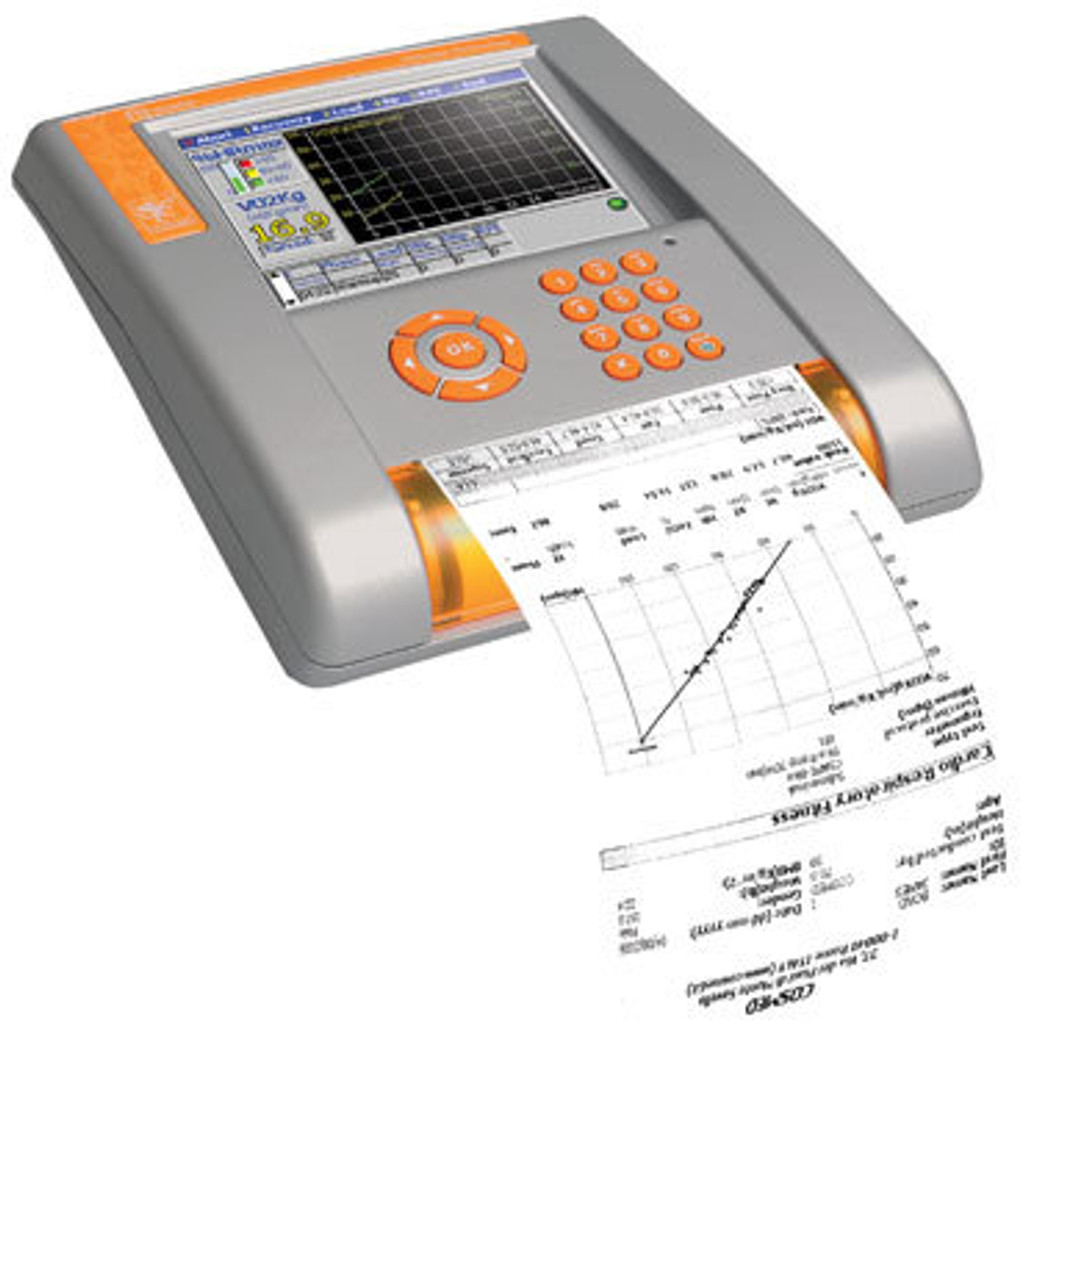 Cosmed Fitmate PRO - Desktop Metabolic System